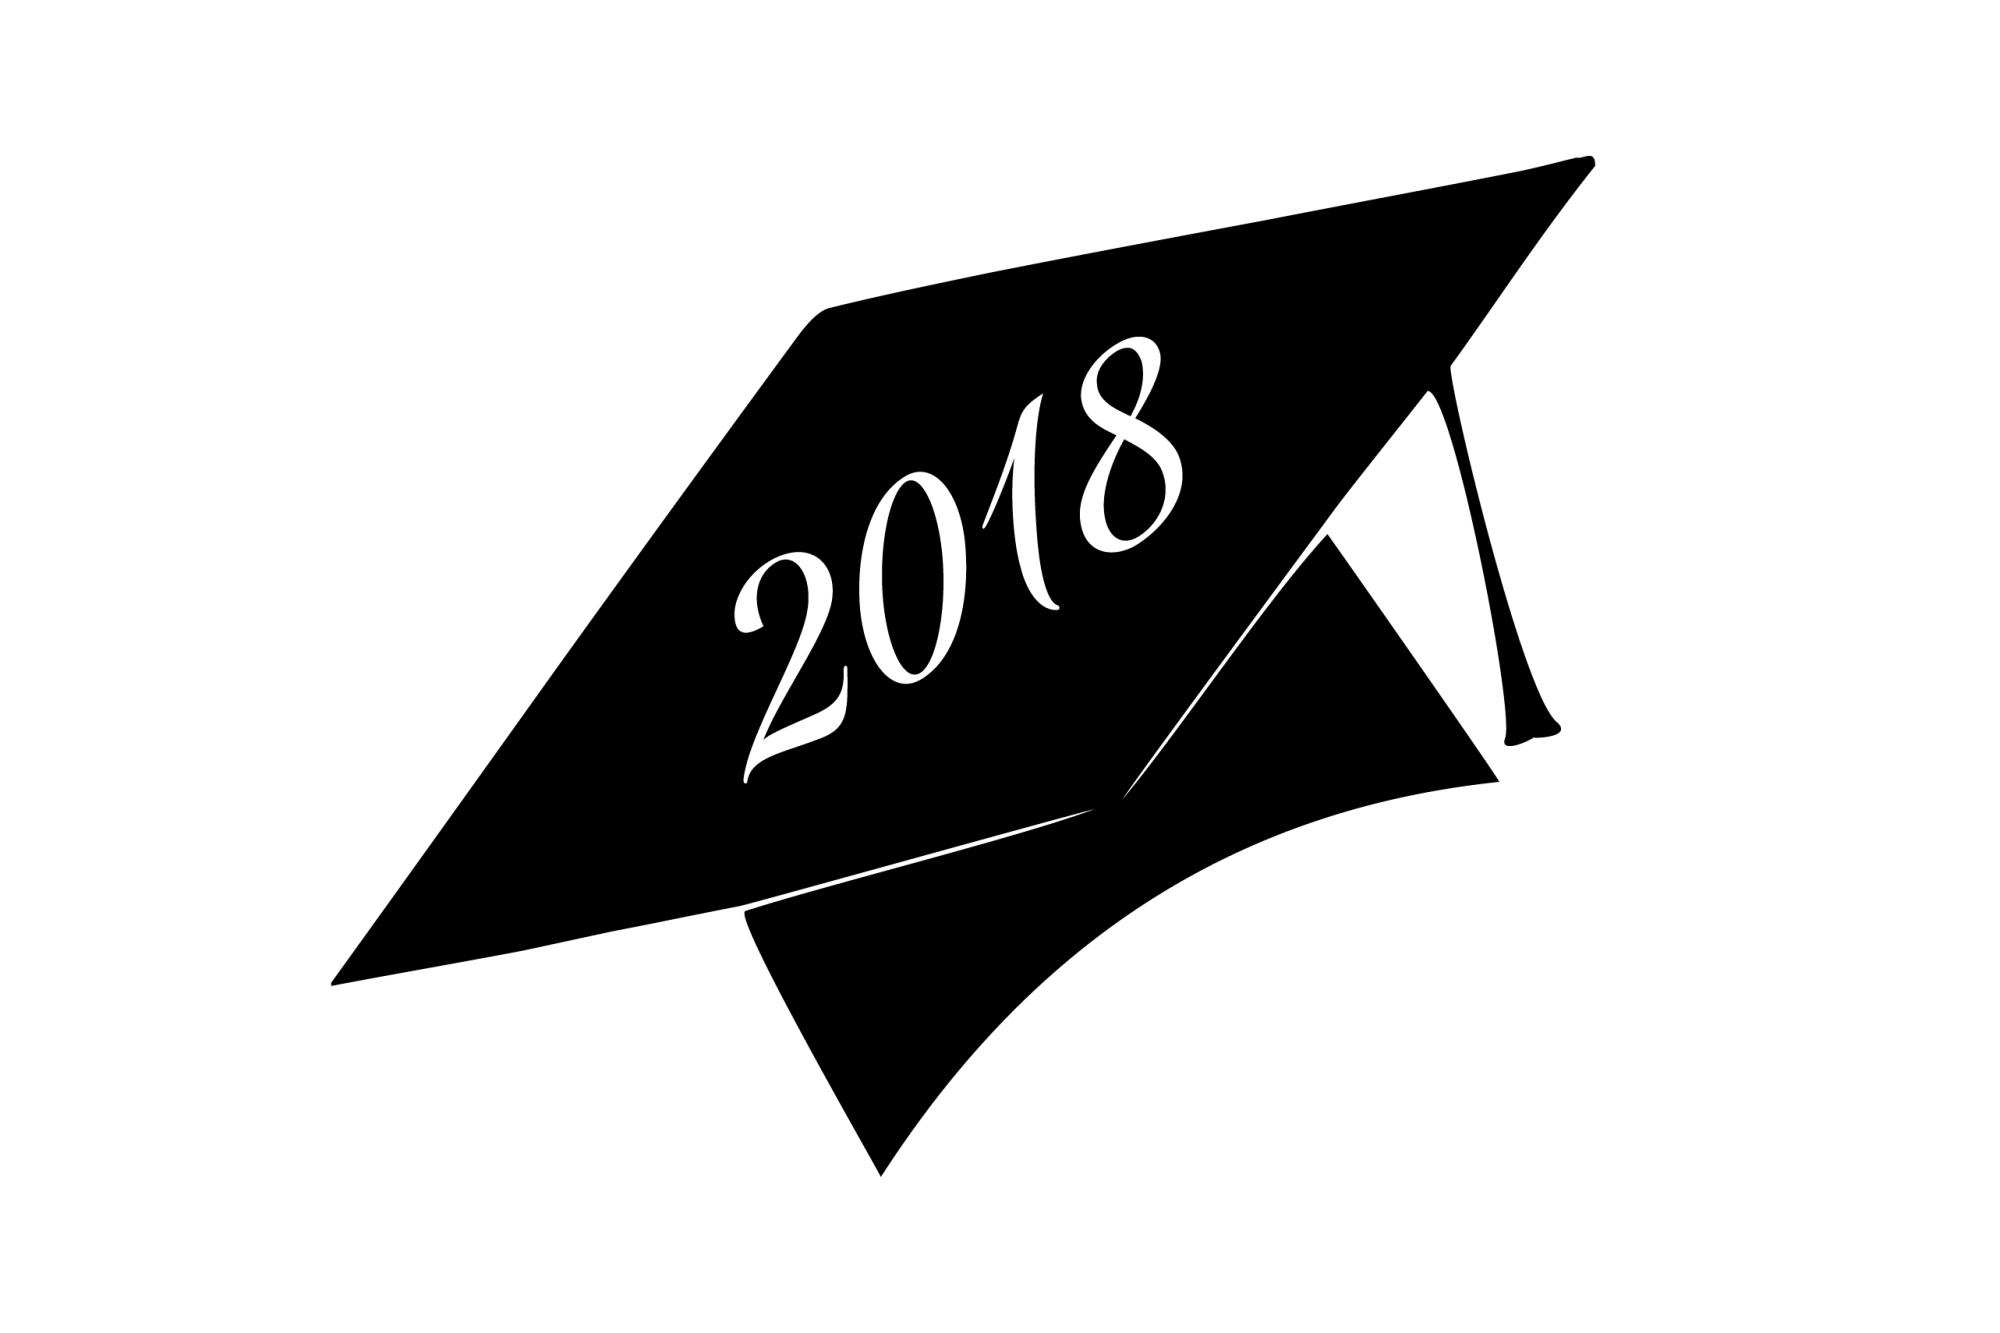 Download Free Graduation Svg | Graduation printables, Graduation signs